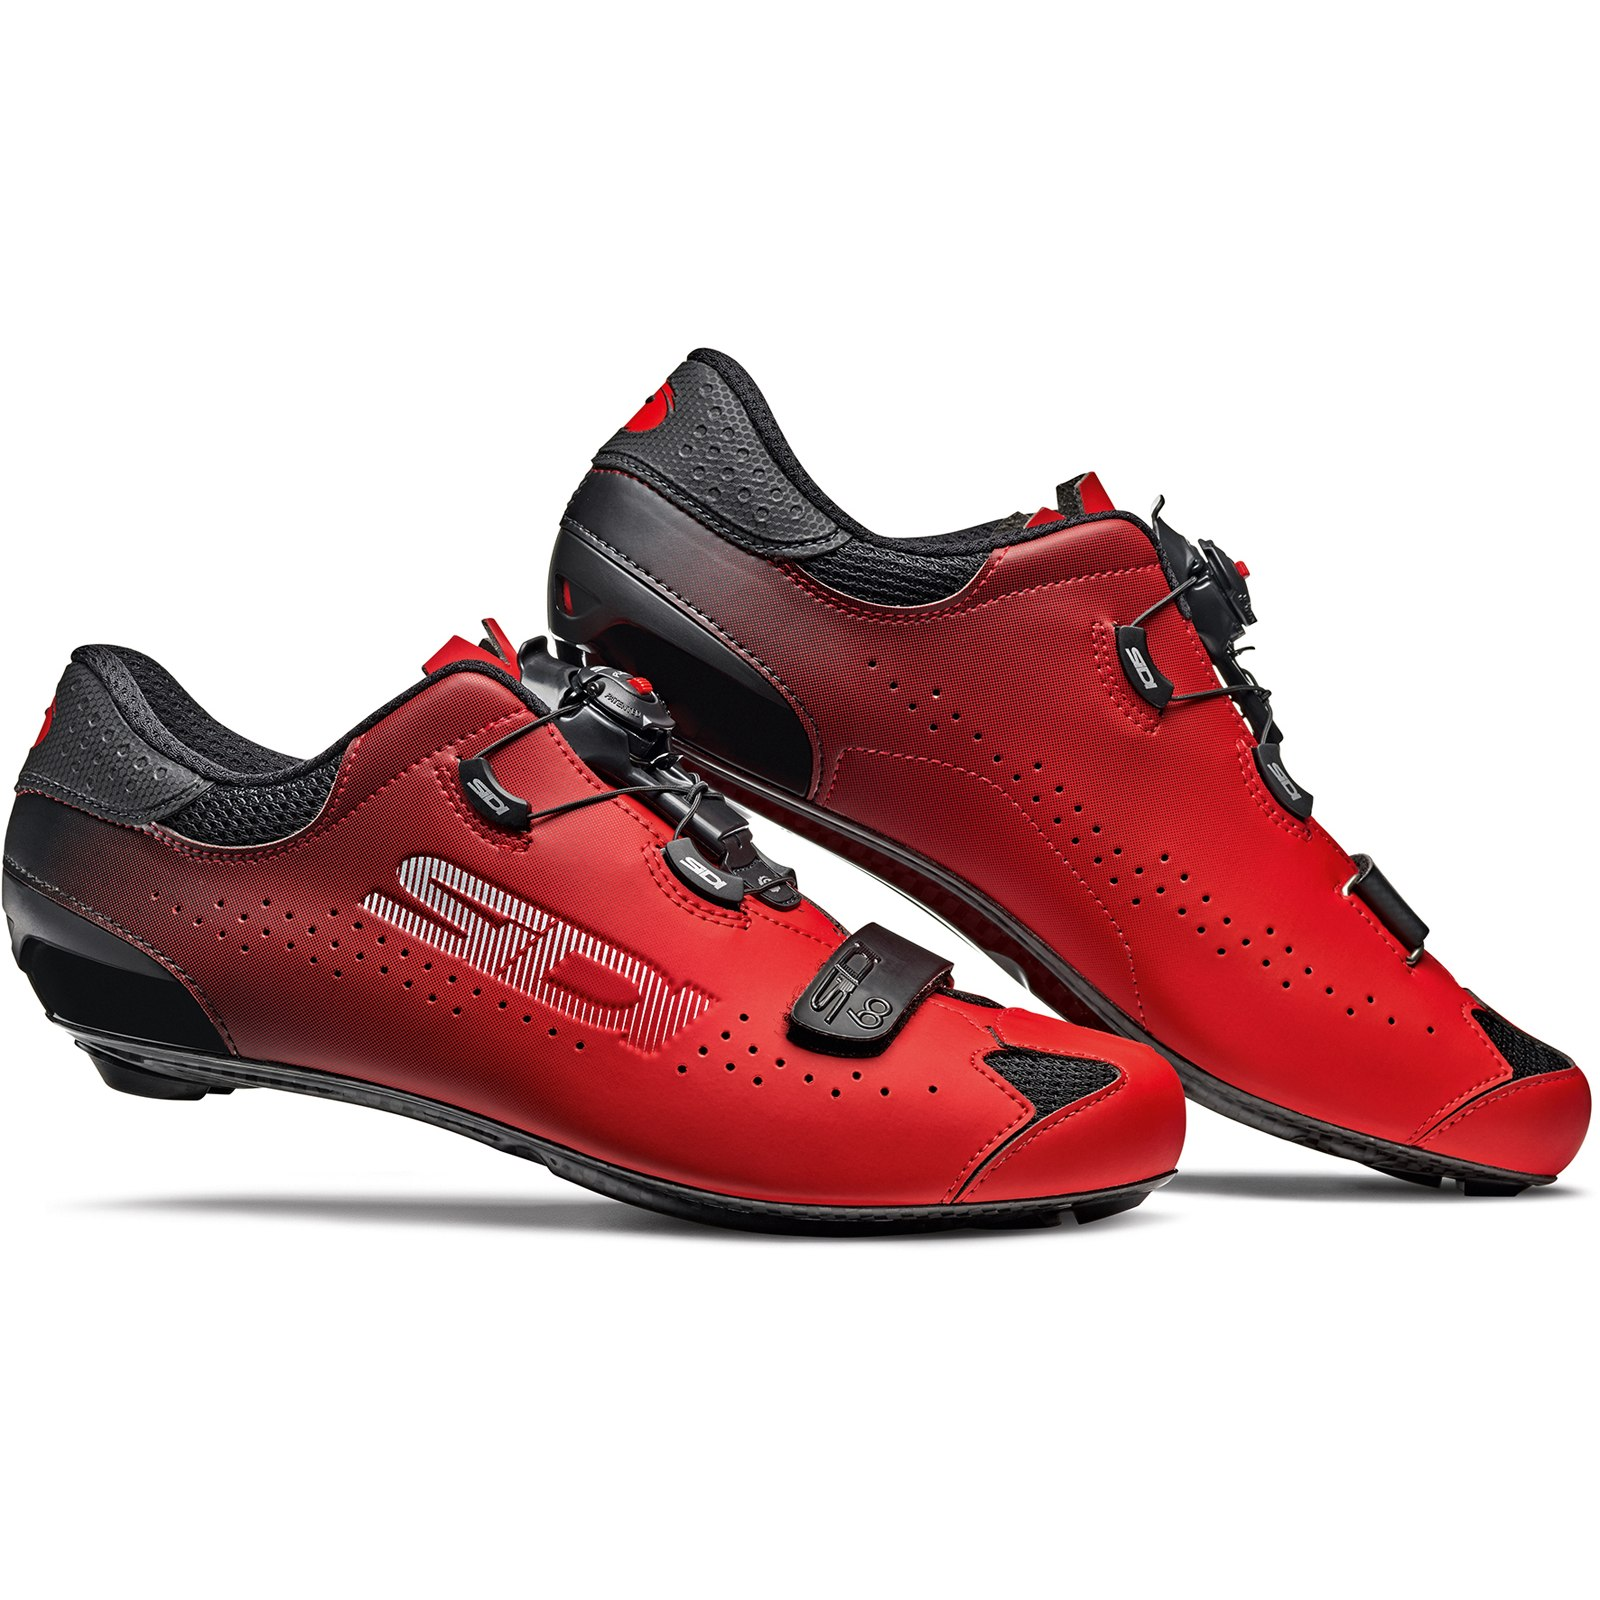 Sidi Sixty - Zapatillas ciclismo carretera - negro/rojo